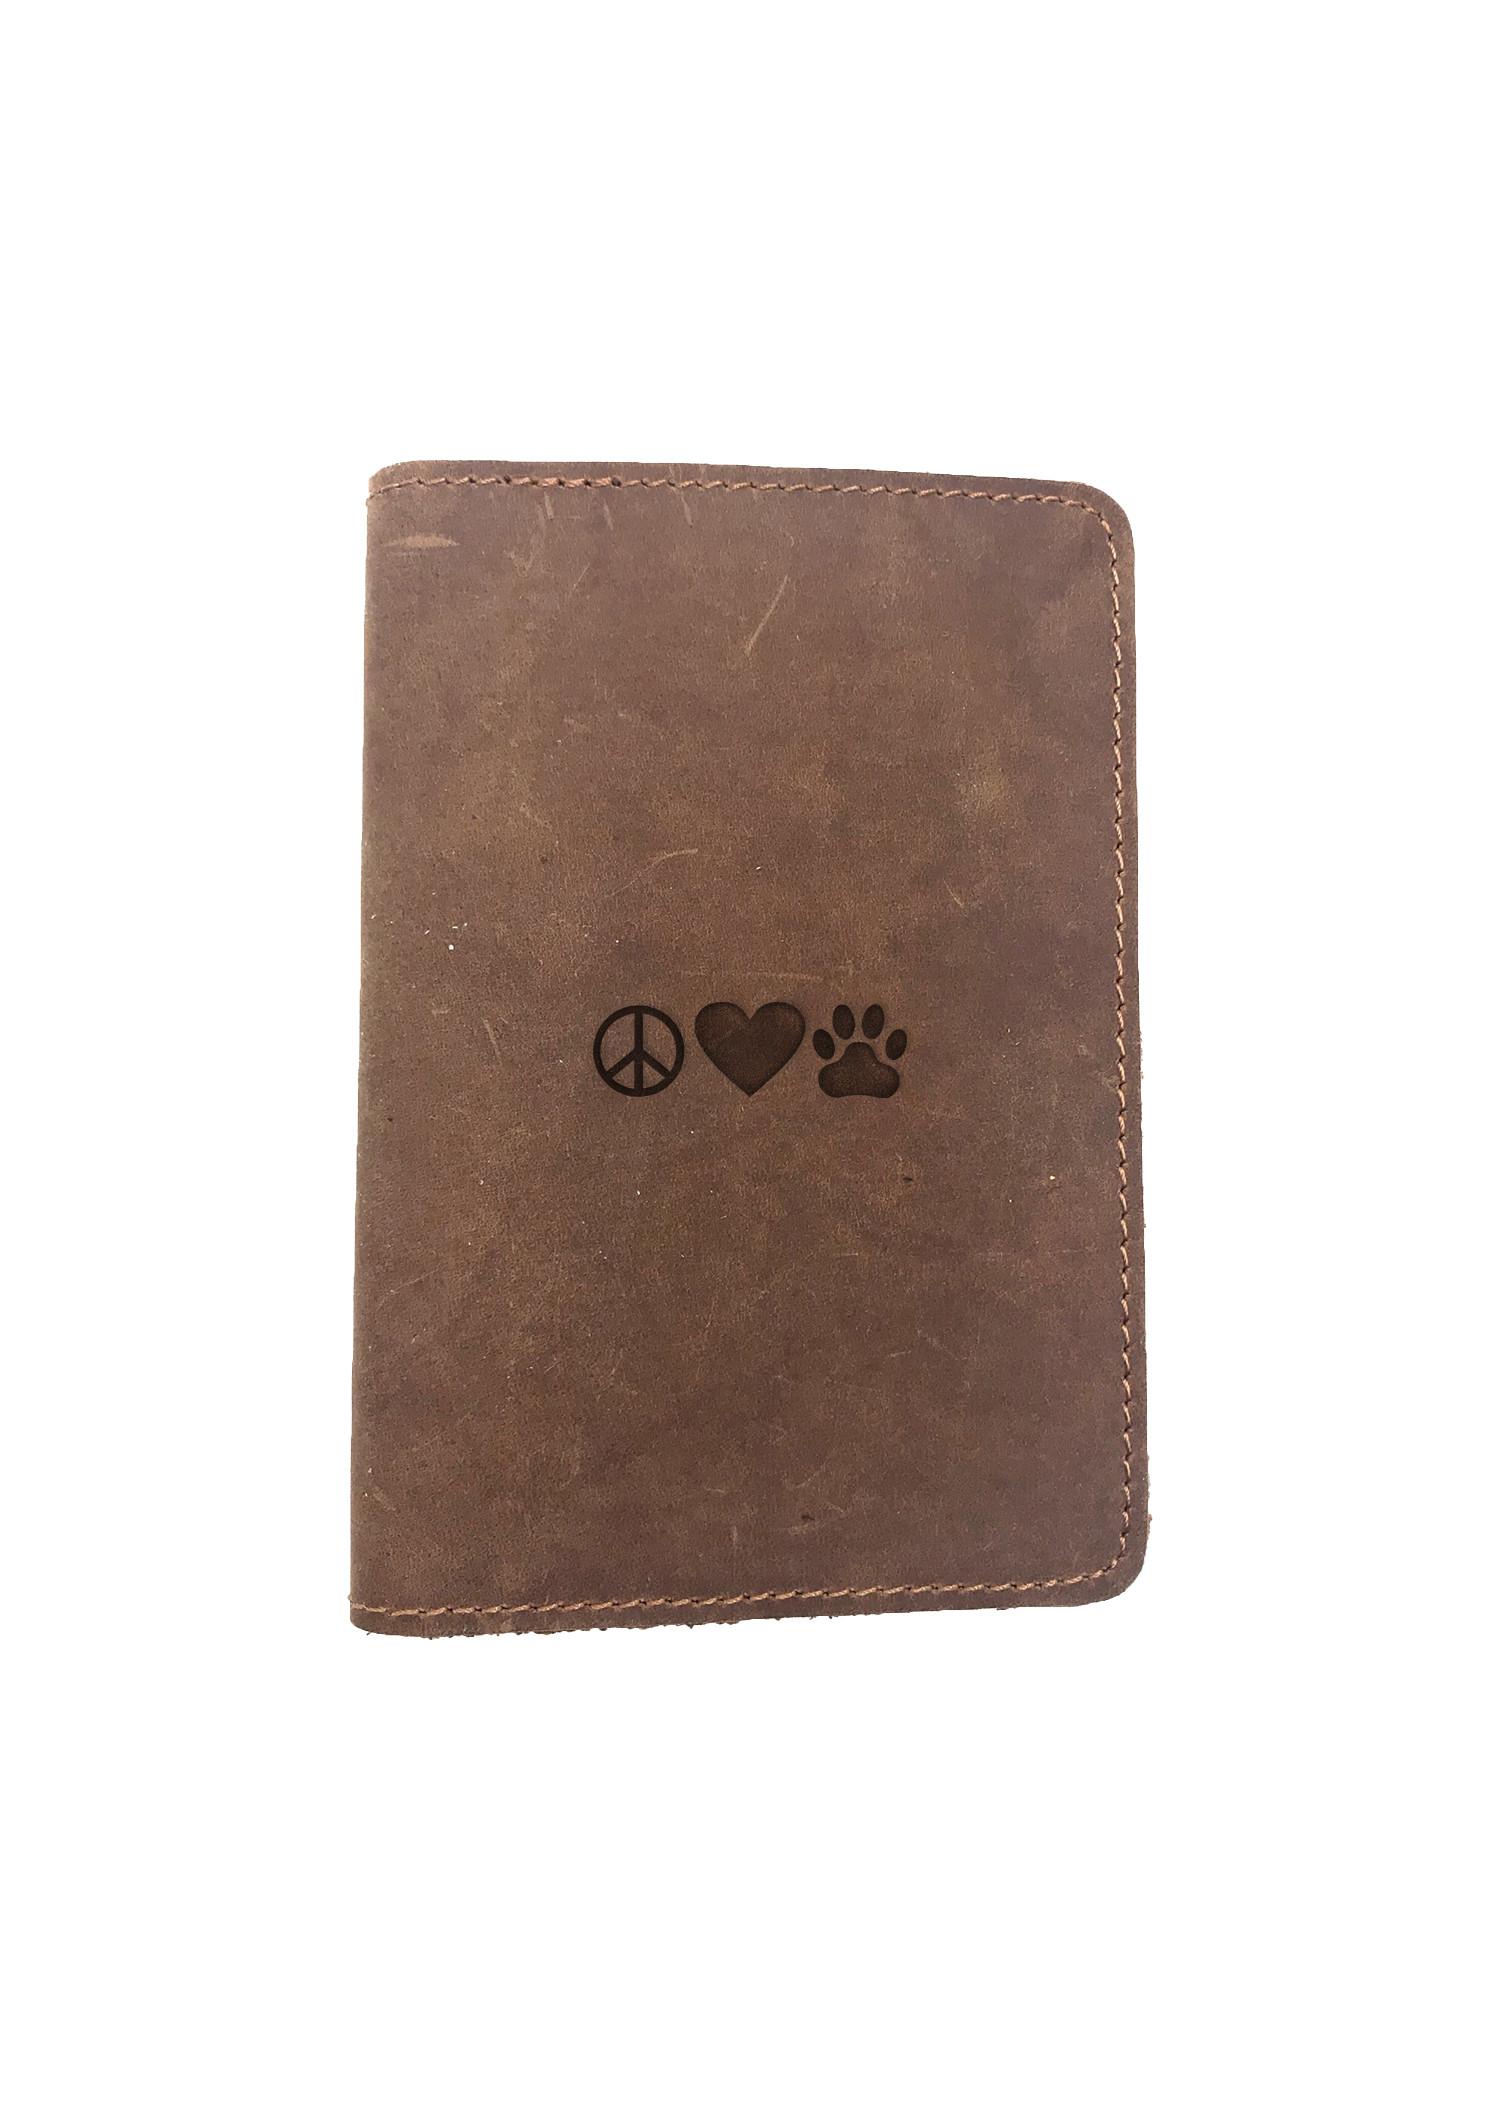 Passport Cover Bao Da Hộ Chiếu Da Sáp Khắc Hình Chữ PEACE LOVE PET (BROWN)